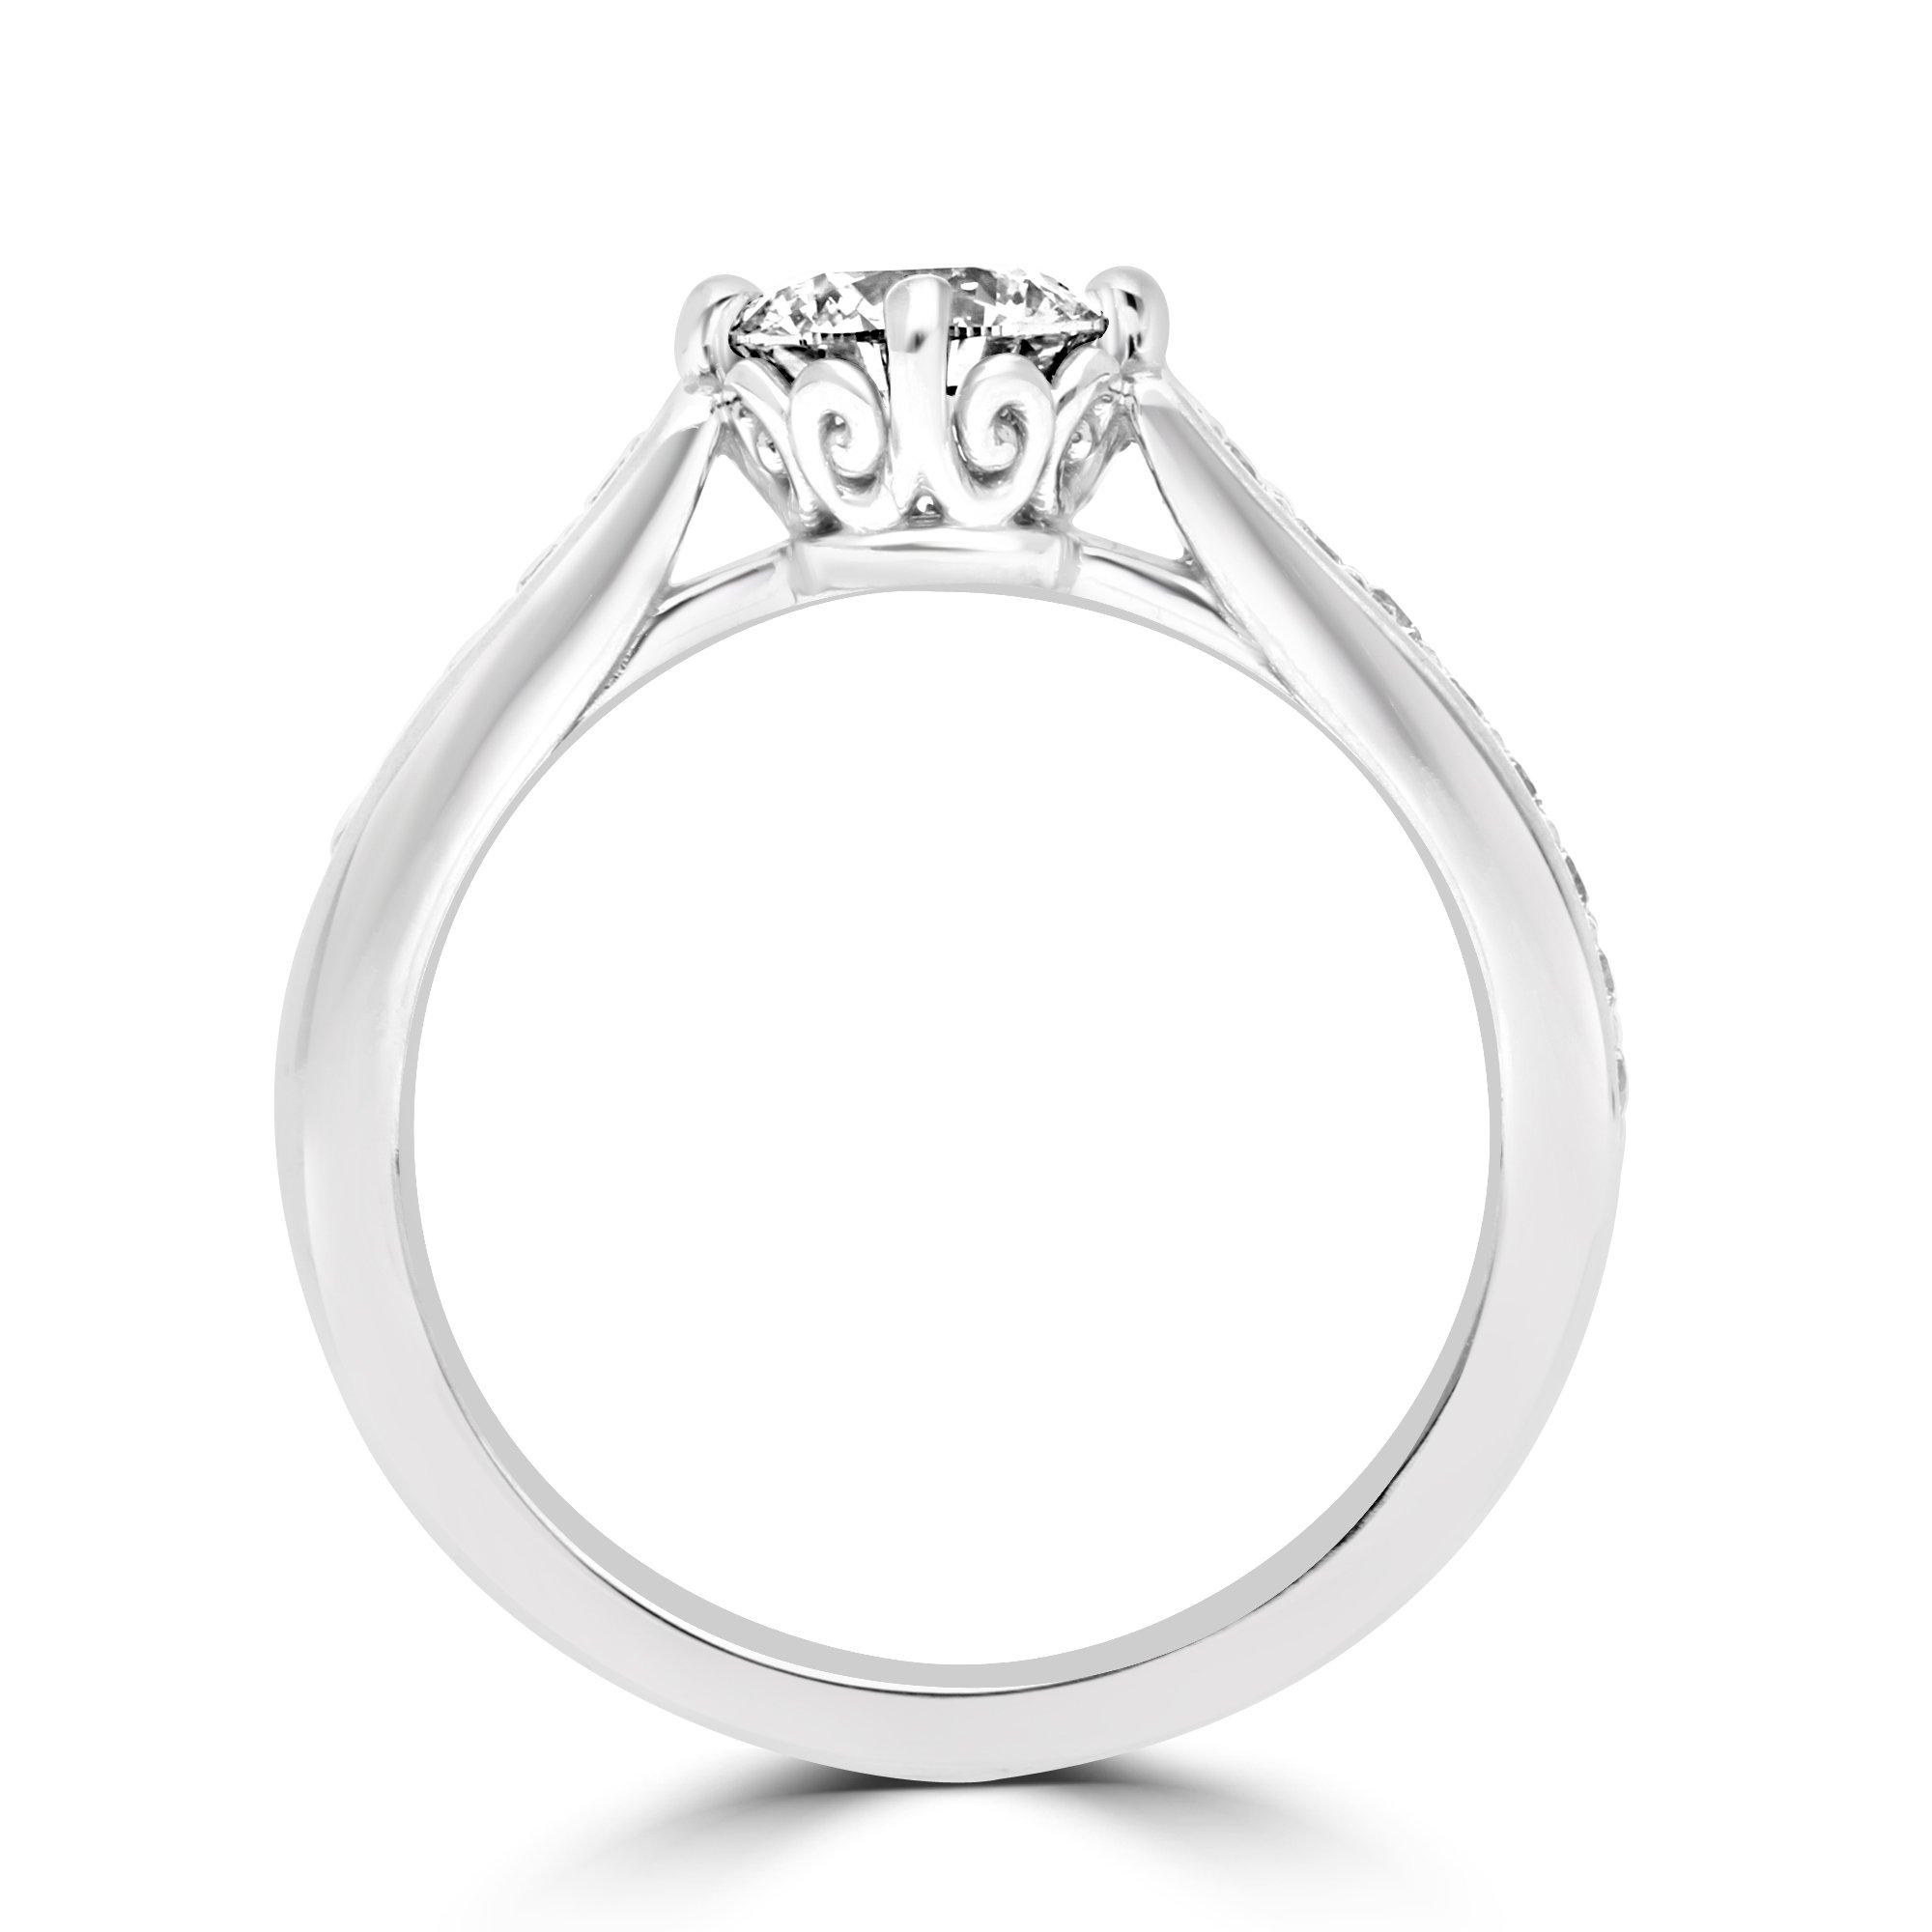 Napa Diamond Ring in White Gold - madeinUSAdiamonds